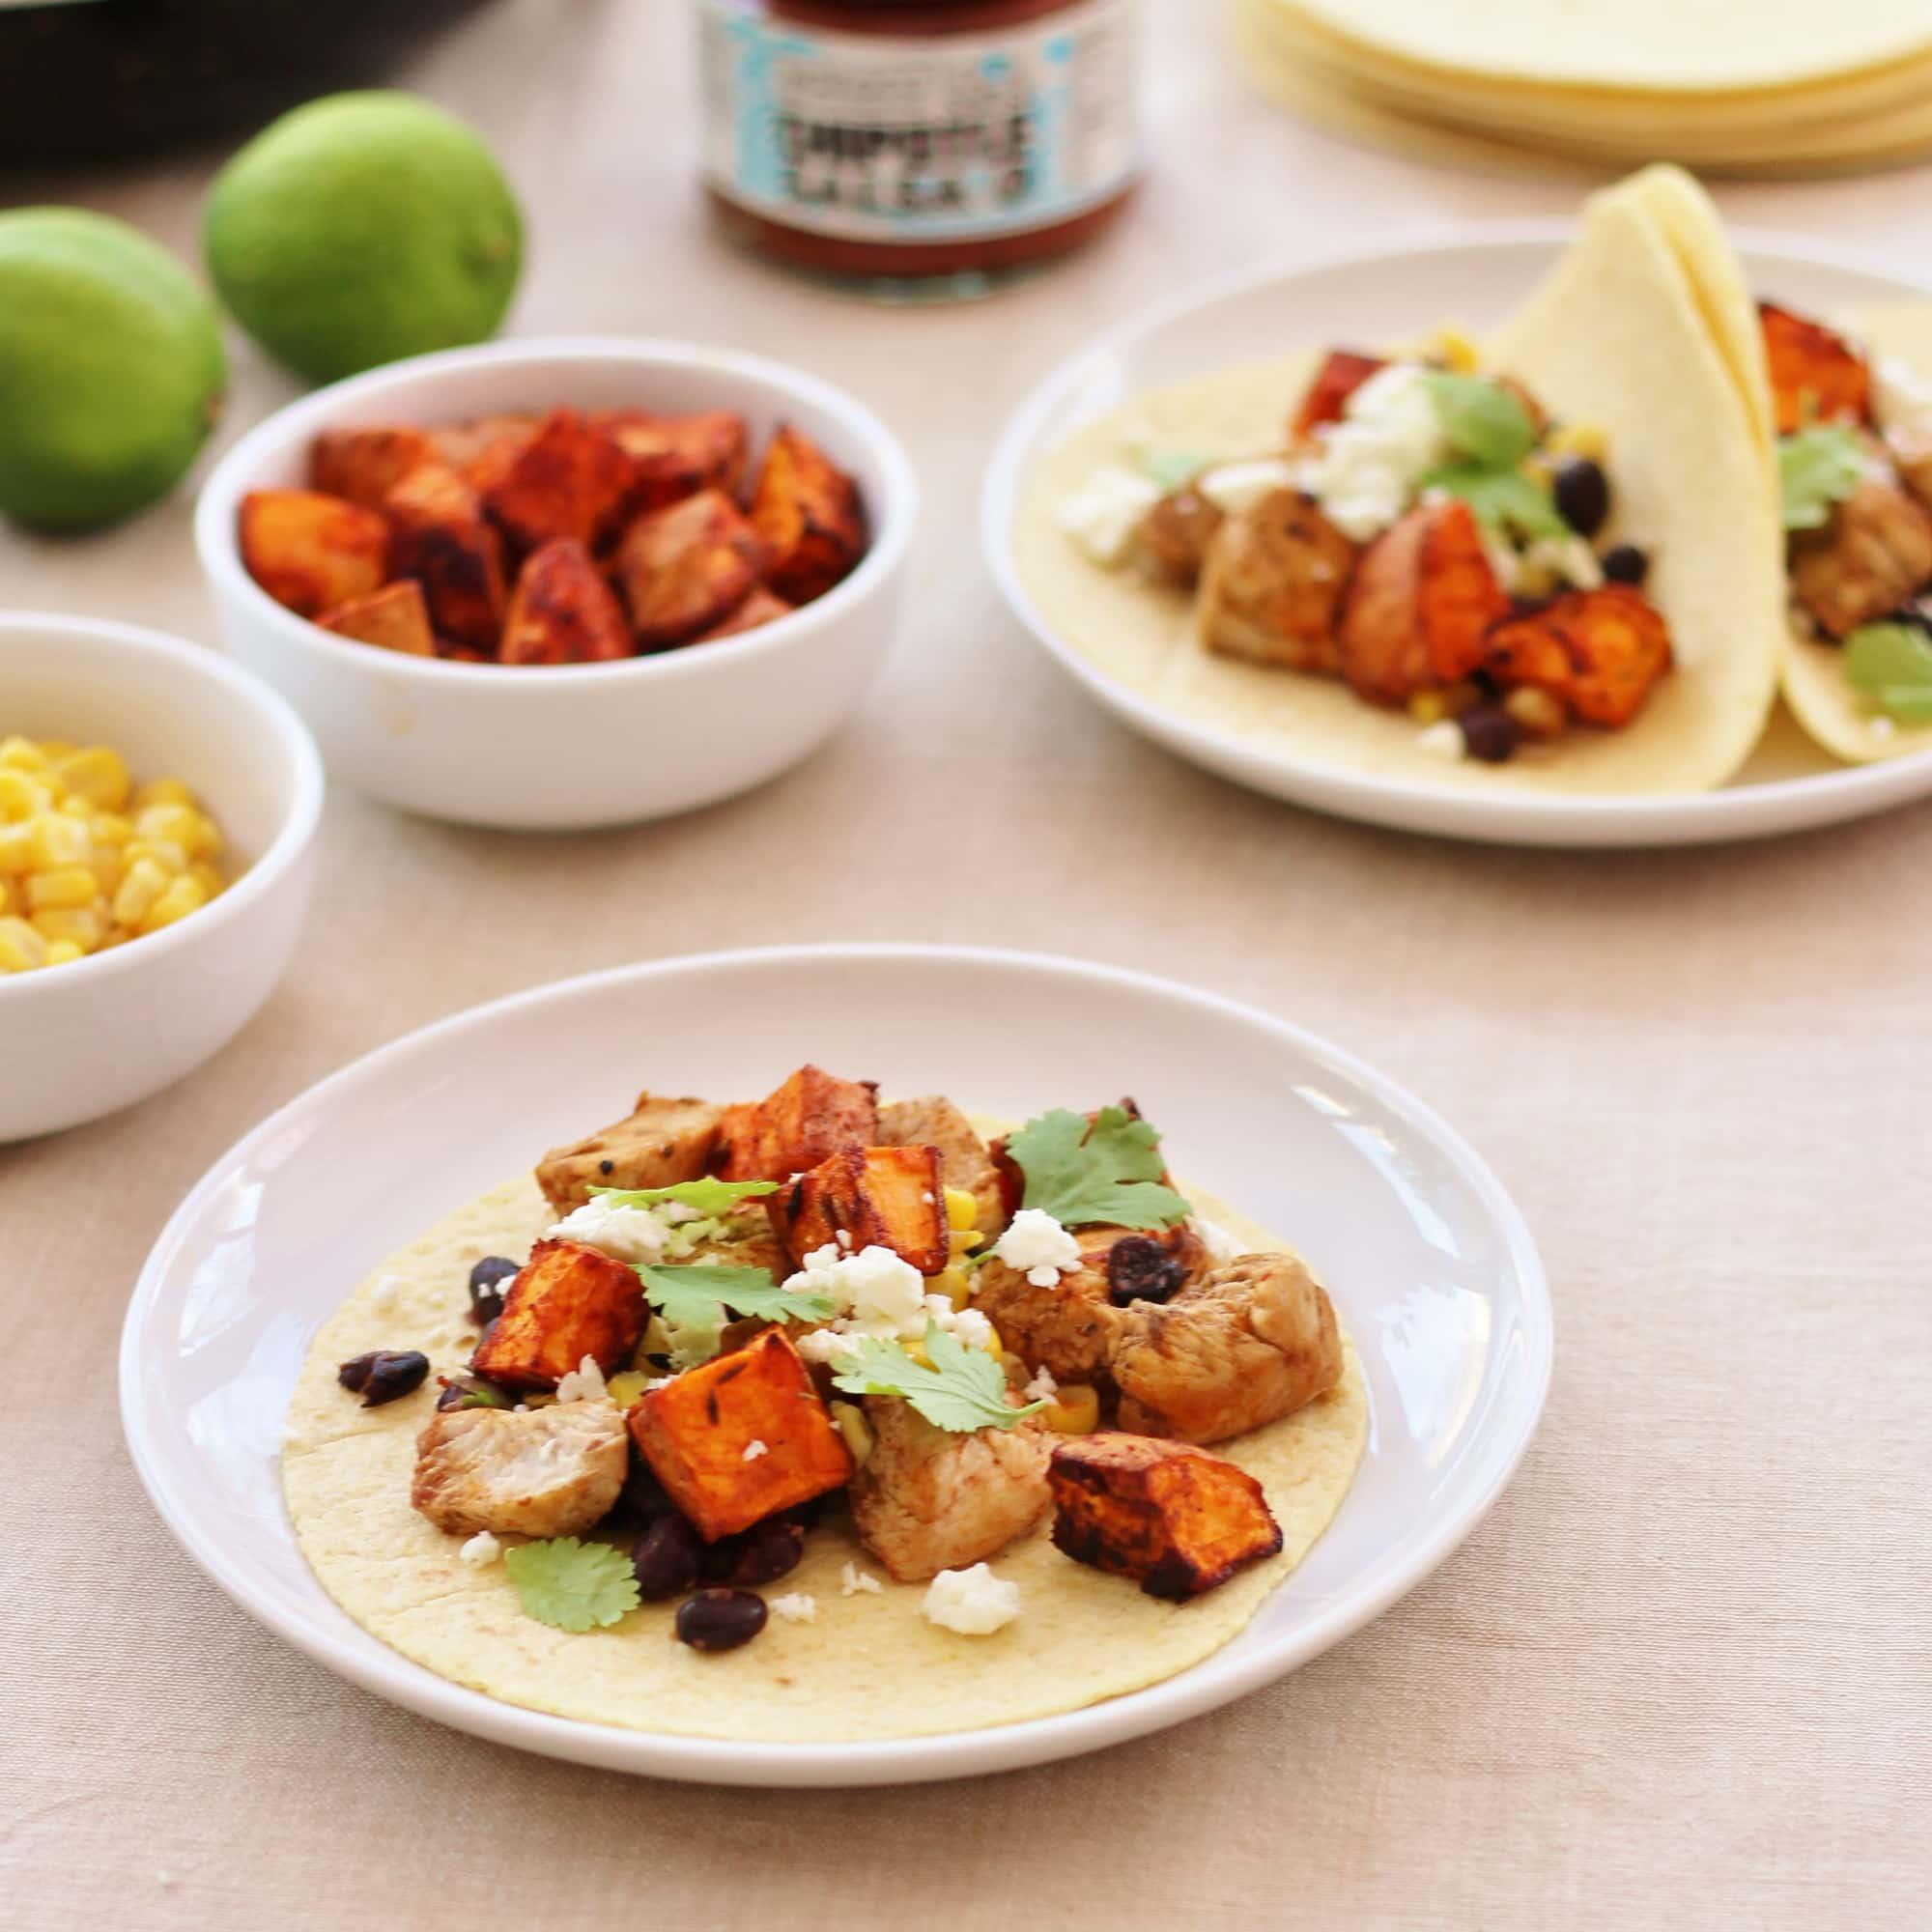 Turkey, Sweet Potato and Black Bean Tacos